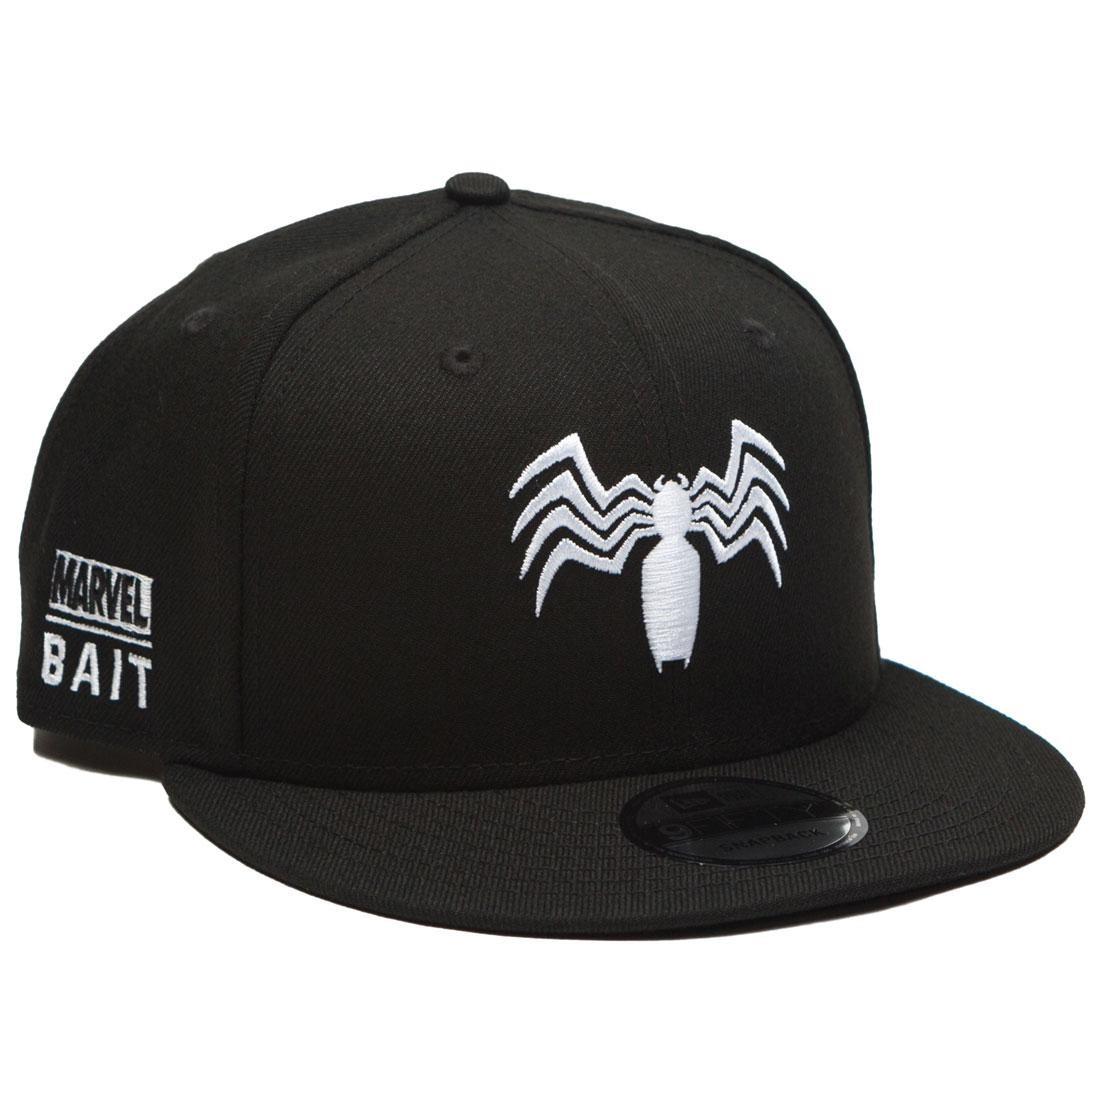 BAIT x Marvel x New Era 9Fifty Venom Logo Black Snapback Cap black aeaa826f606